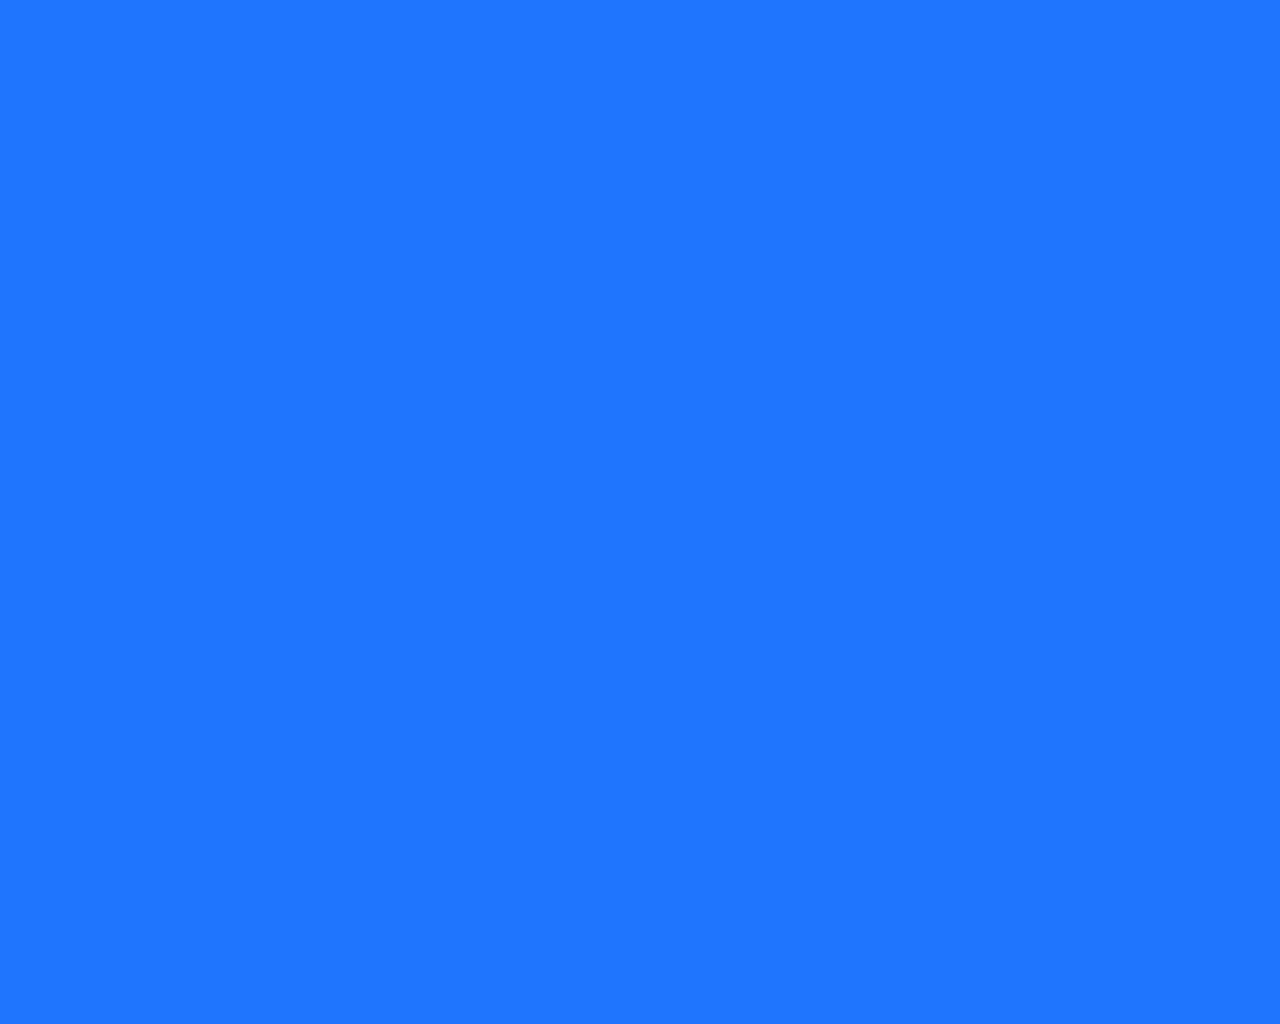 1280x1024 Blue Crayola Solid Color Background